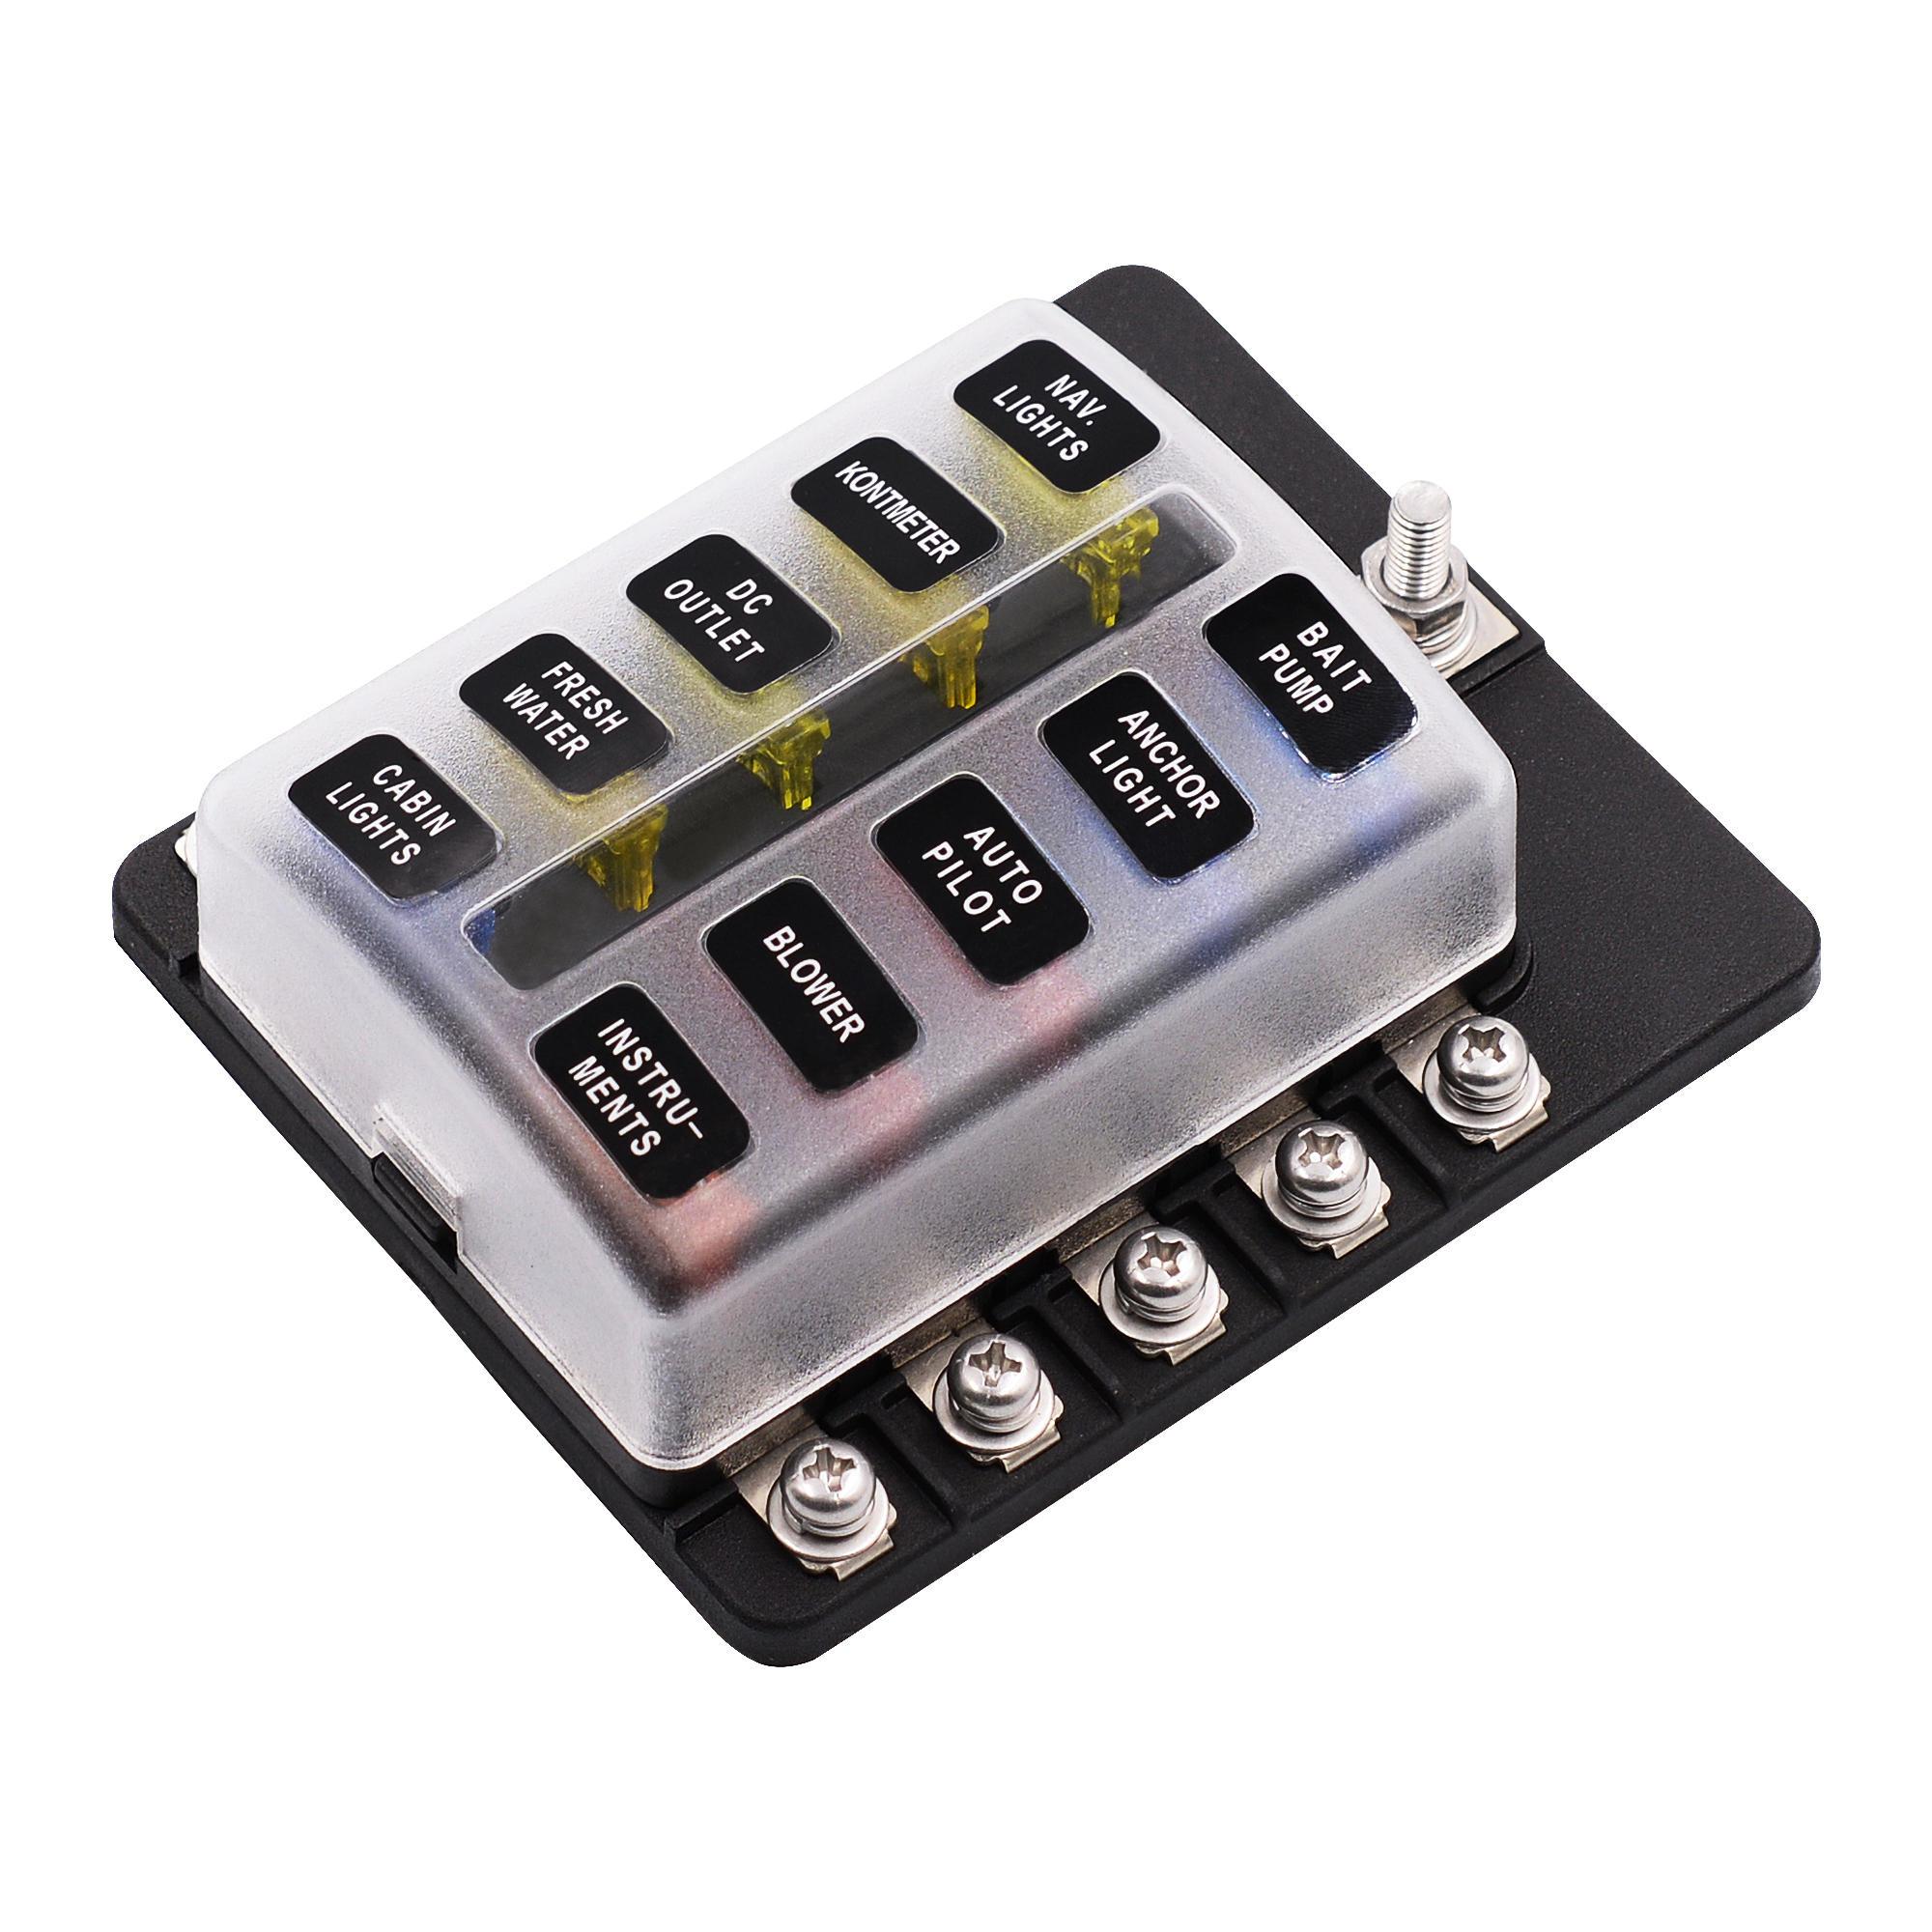 imars™ 10 way fuse box 12v 32v circuit standard blade block holder kit car caravan AC Fuse Holders